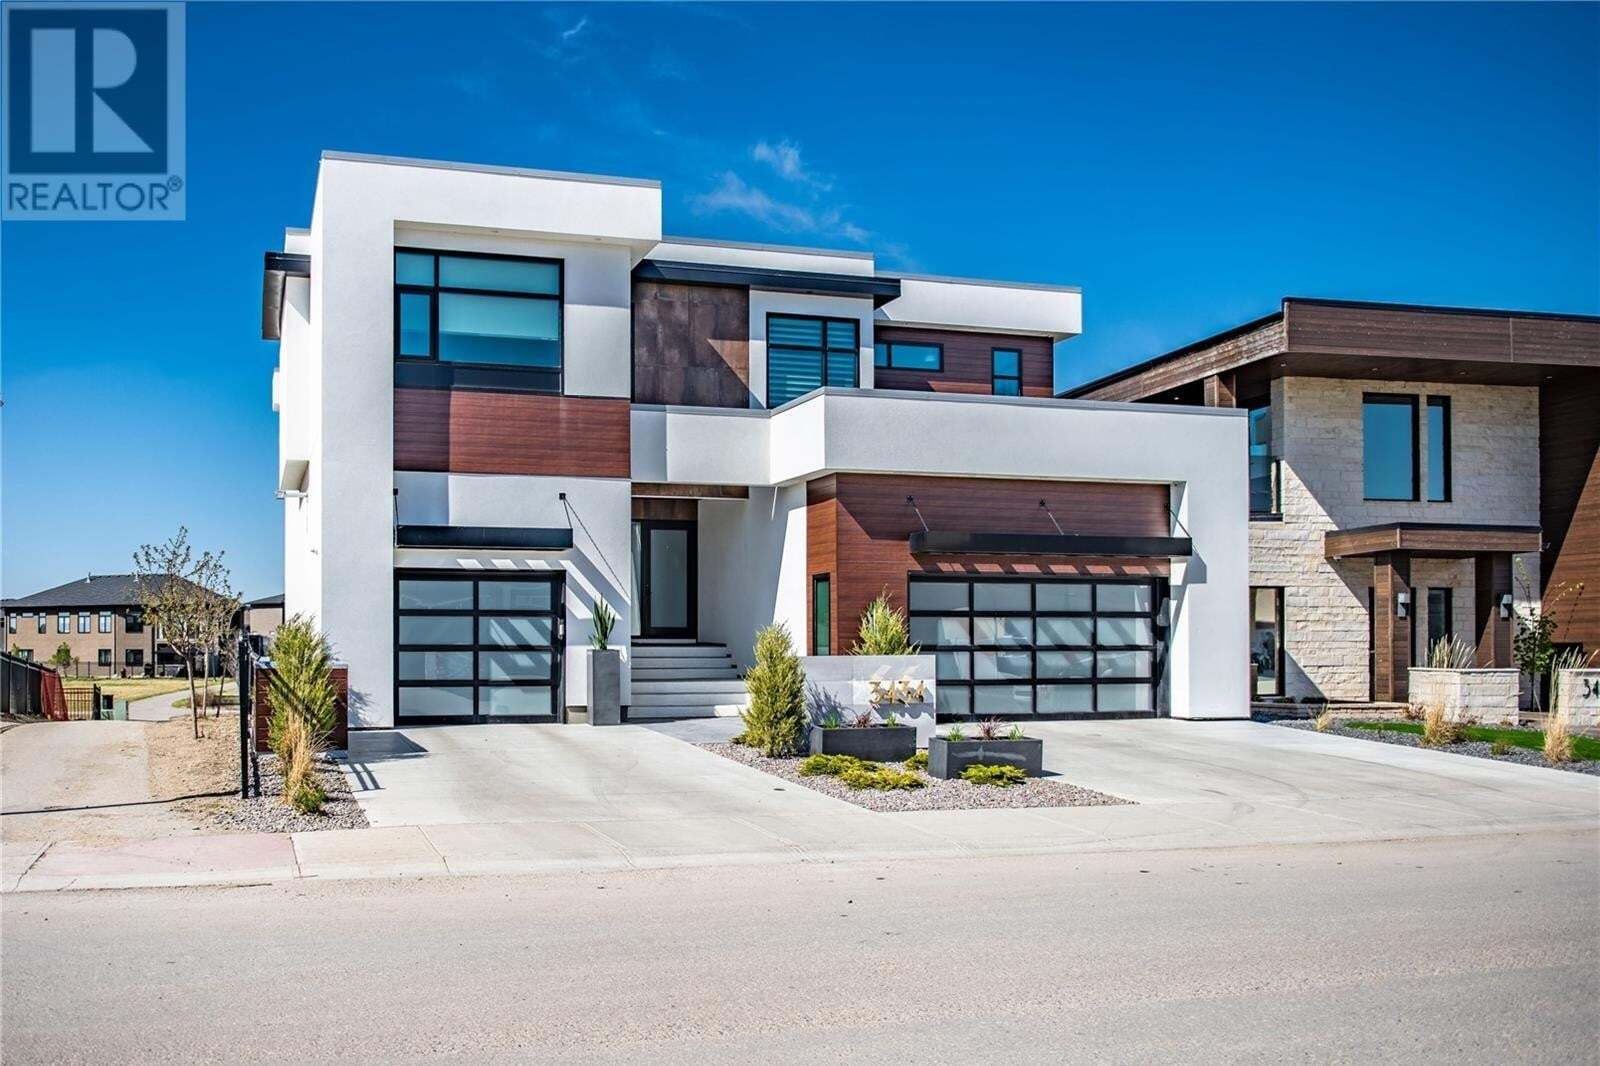 House for sale at 3434 Green Brook Rd Regina Saskatchewan - MLS: SK809649